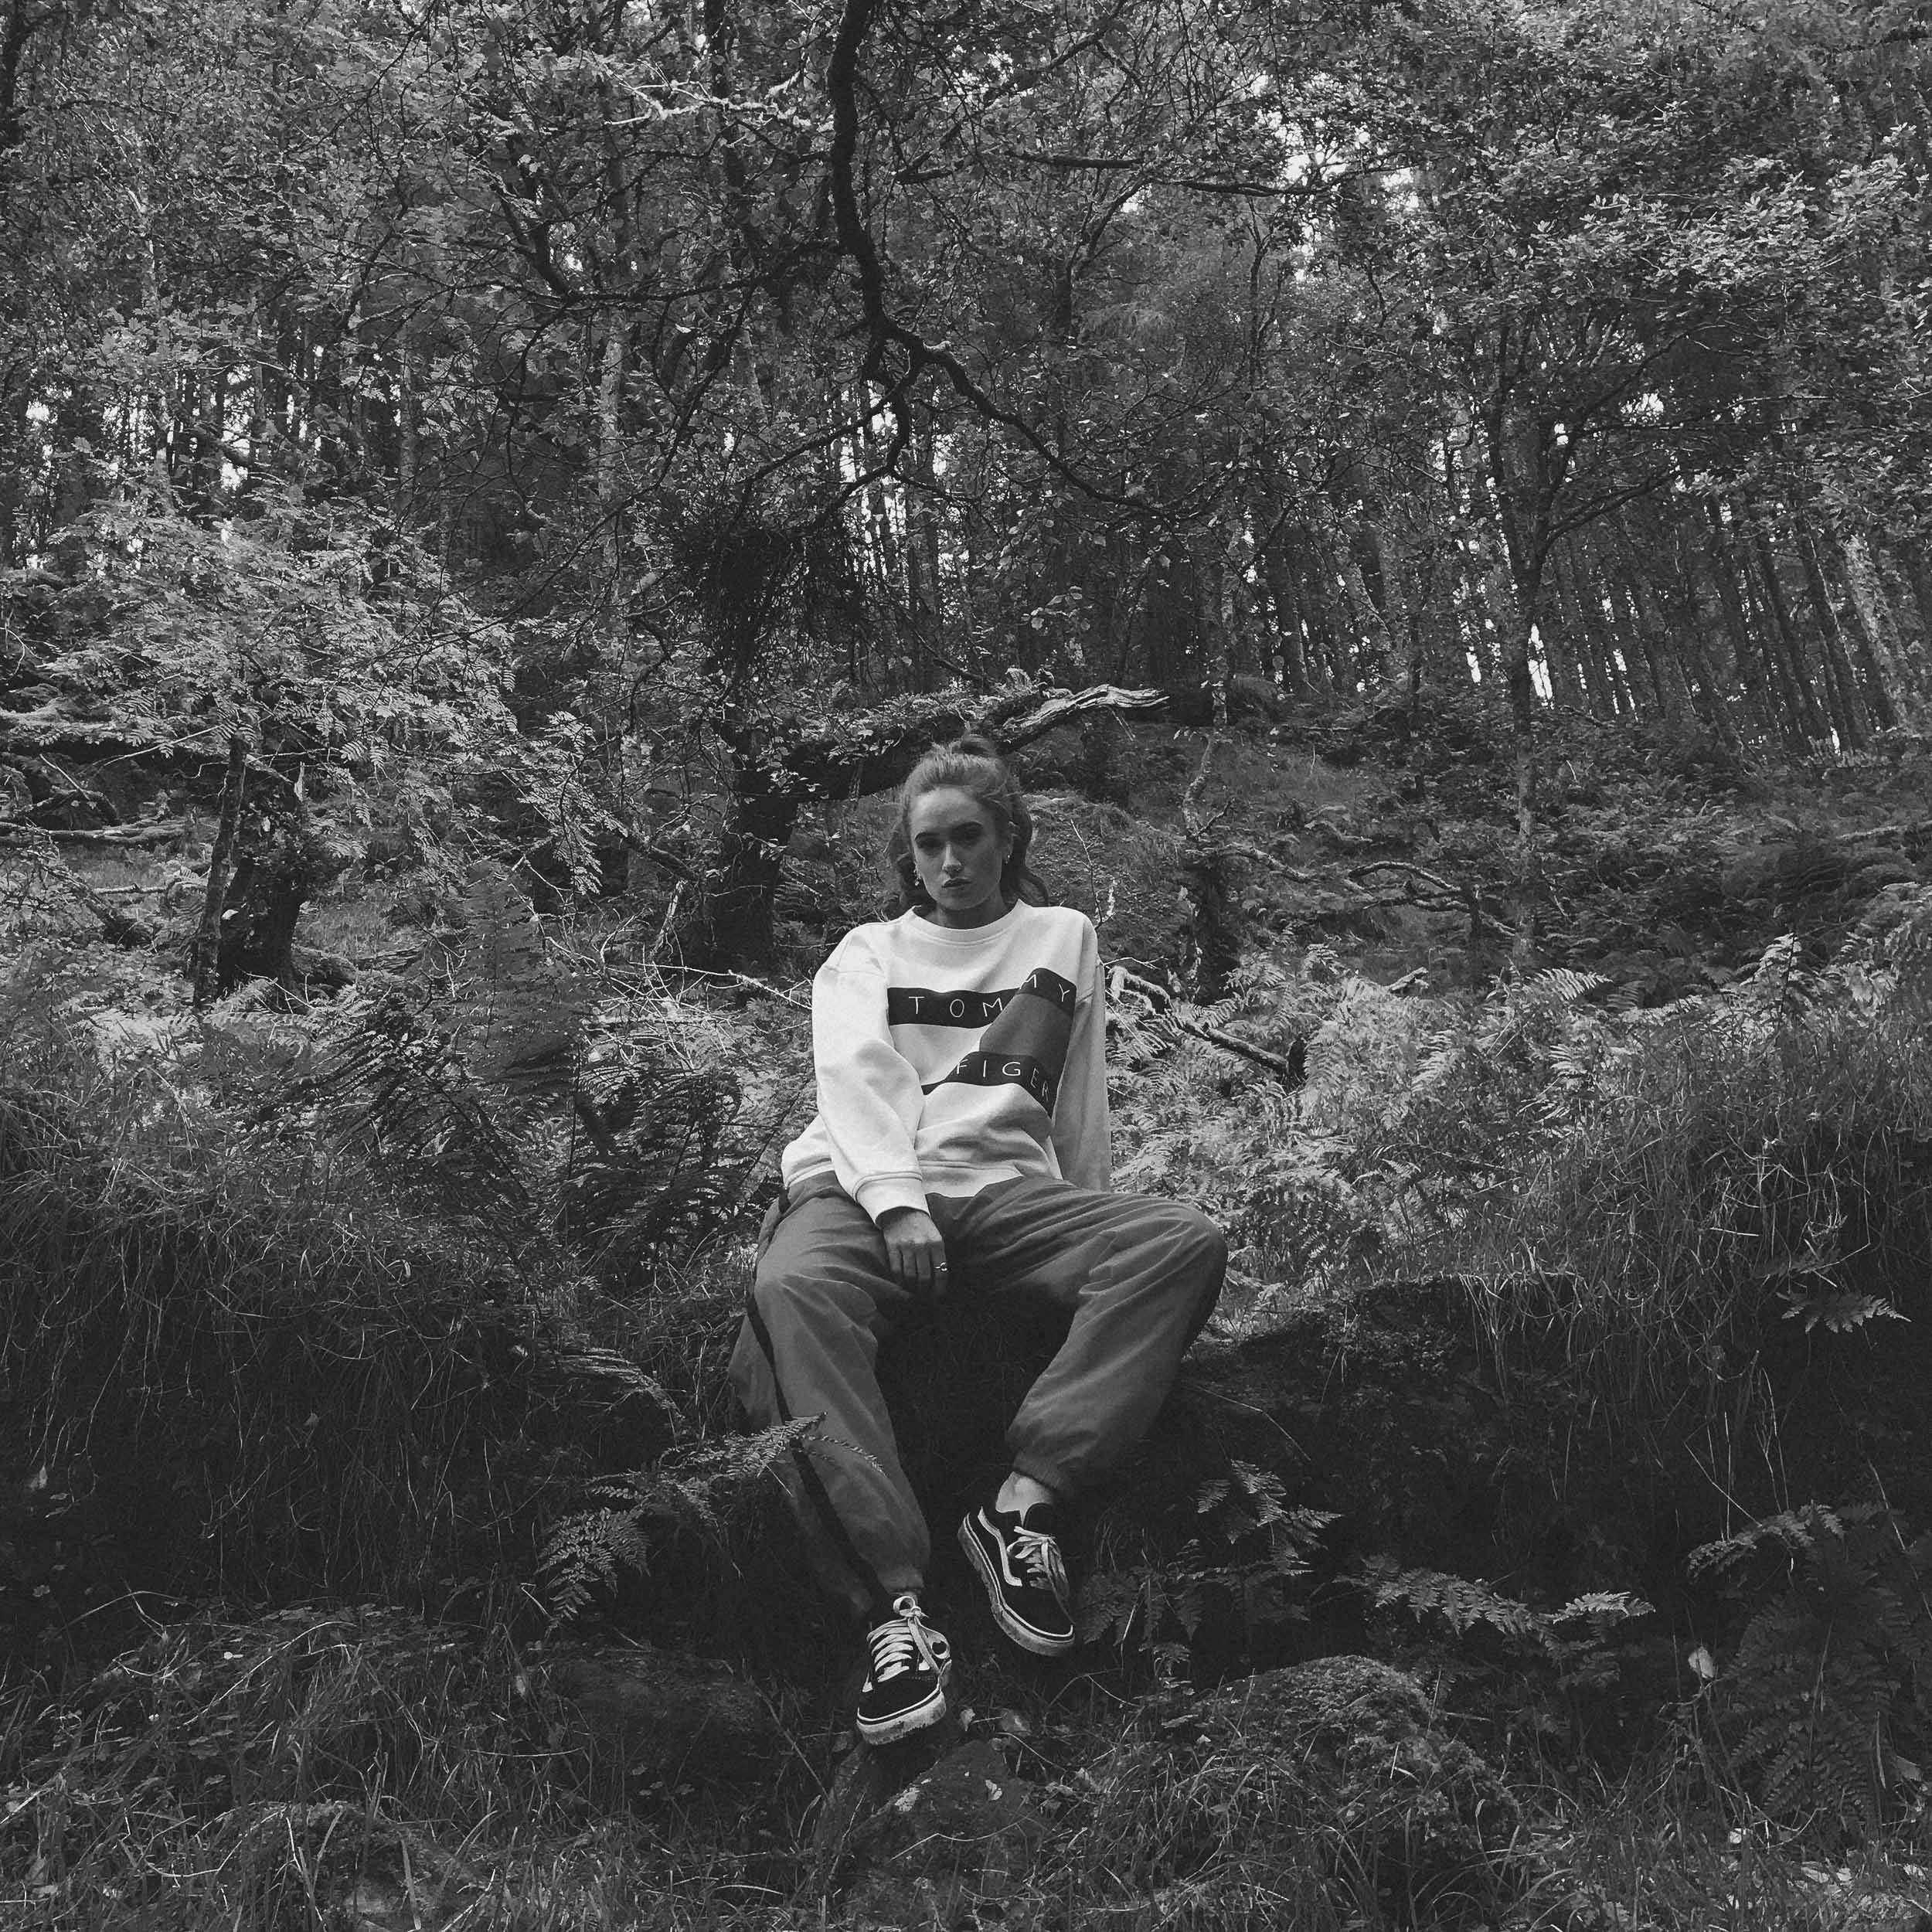 film-archive-kc.locke-63.jpg